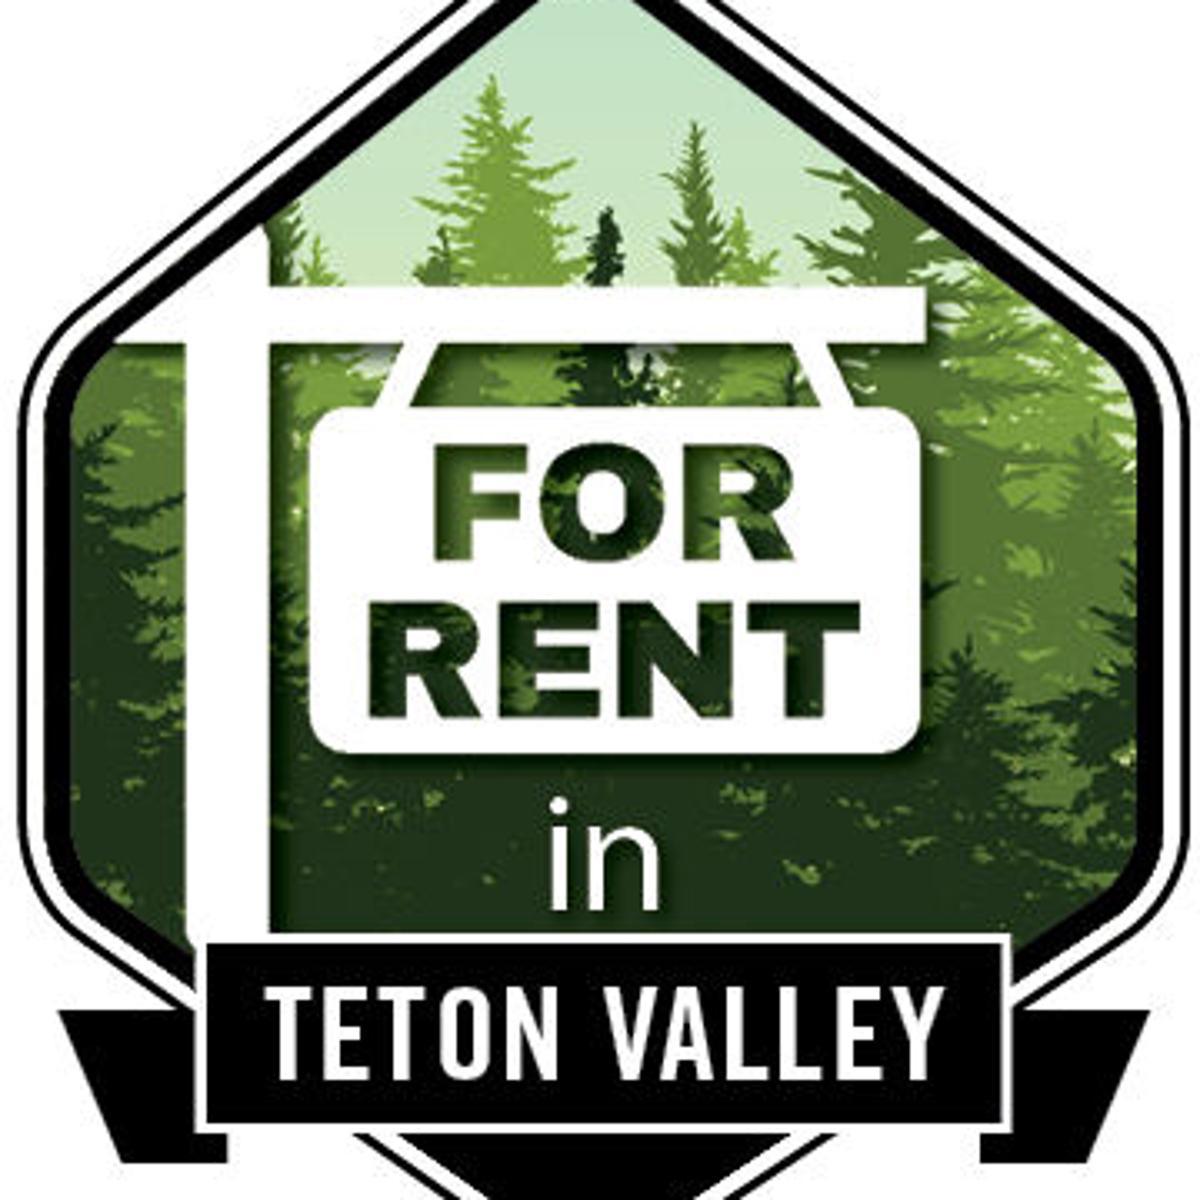 Teton Valley Housing Bulletin Board Housing Tetonvalleynews Net > community events for sale gigs housing jobs resumes services. teton valley housing bulletin board